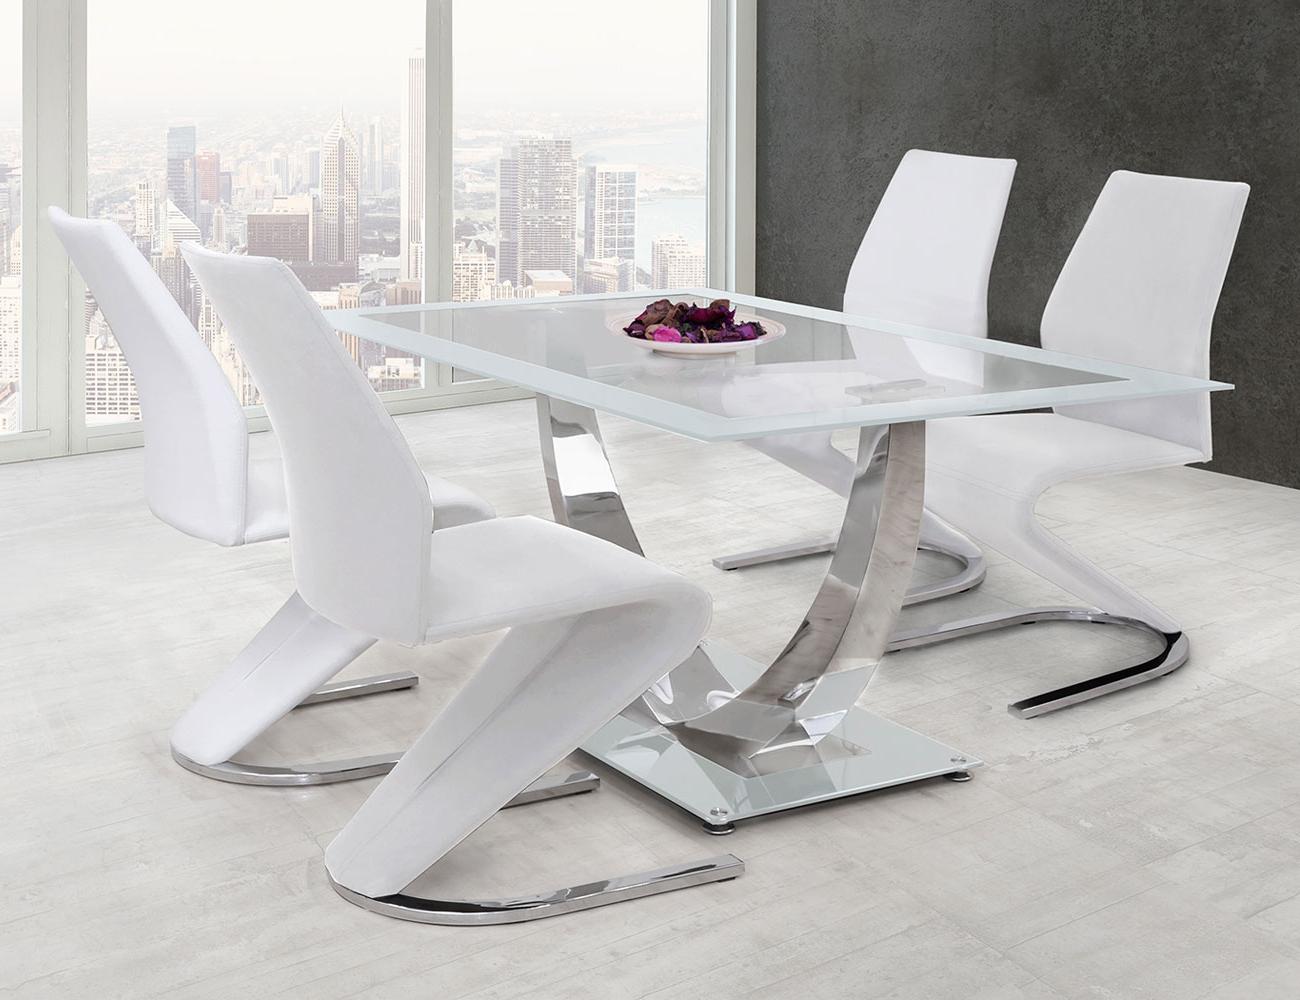 Mesa Salon Cristal Gdd0 Mesa De Edor De Cristal Templado Decorativa En Blanco